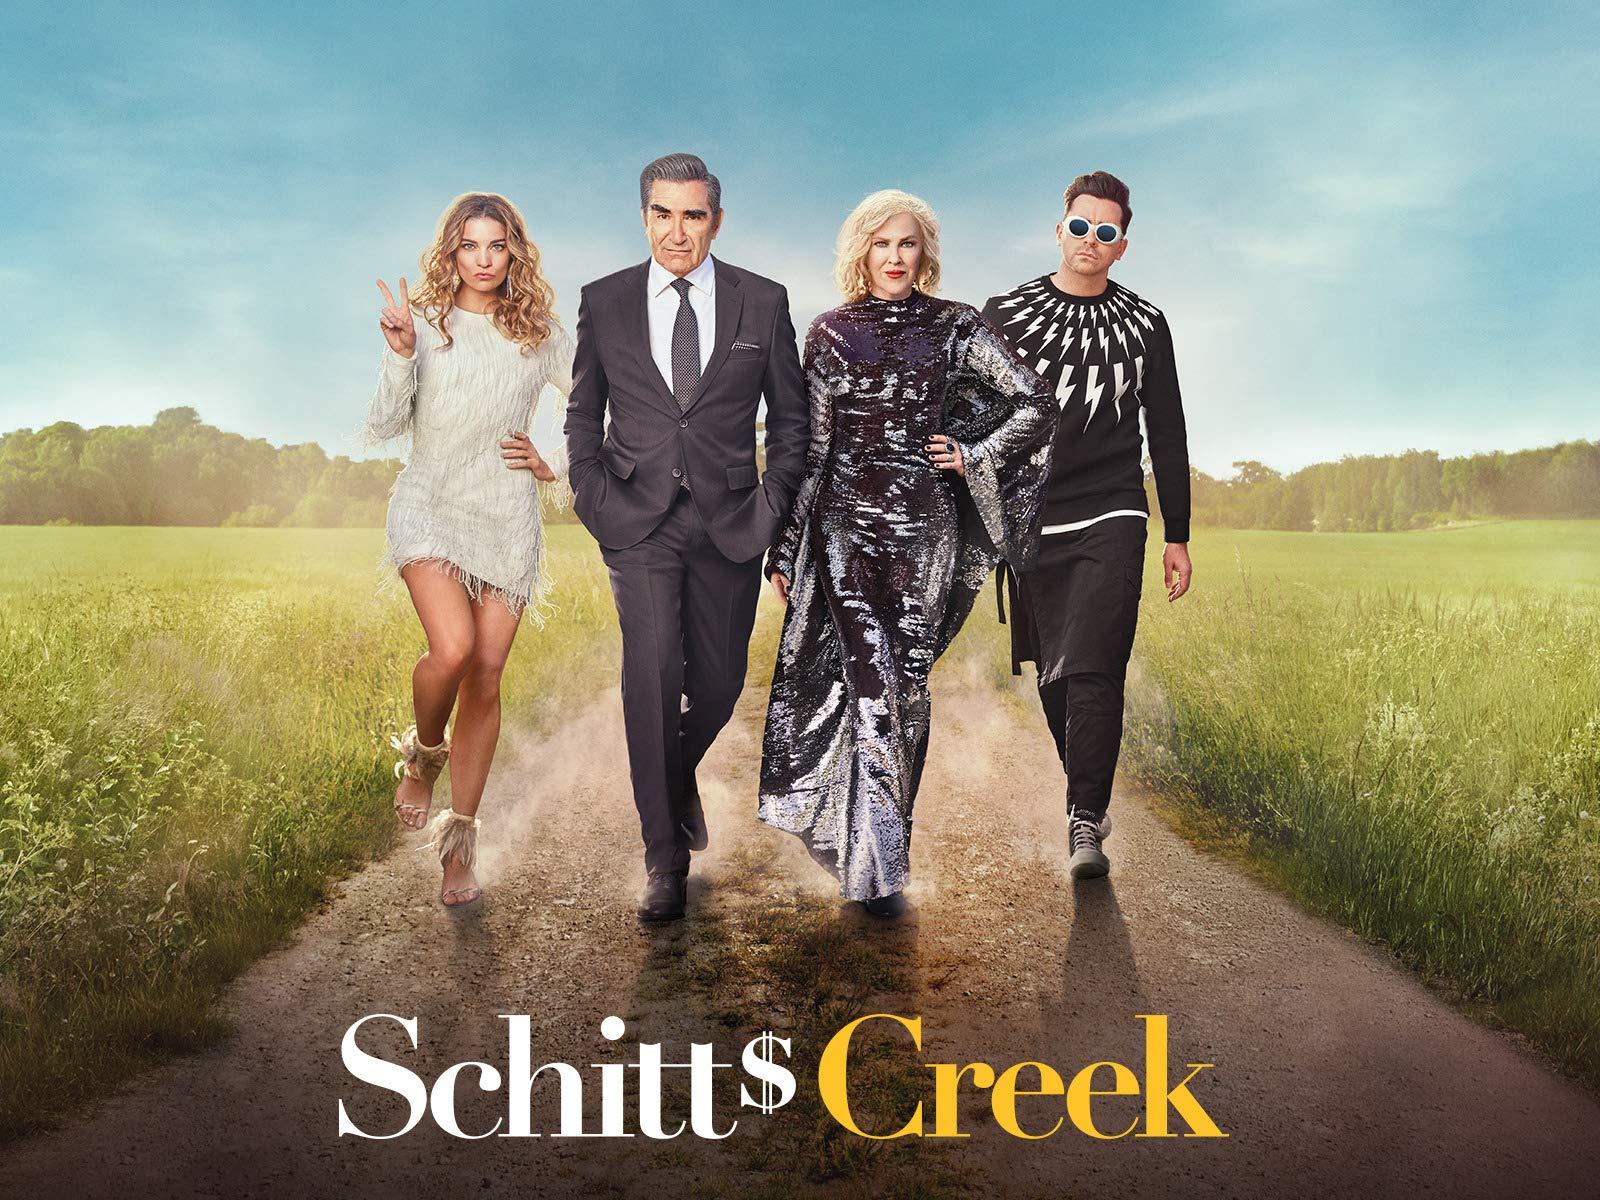 Jeff is a big fan of the Canadian sitcom, Schitts Creek